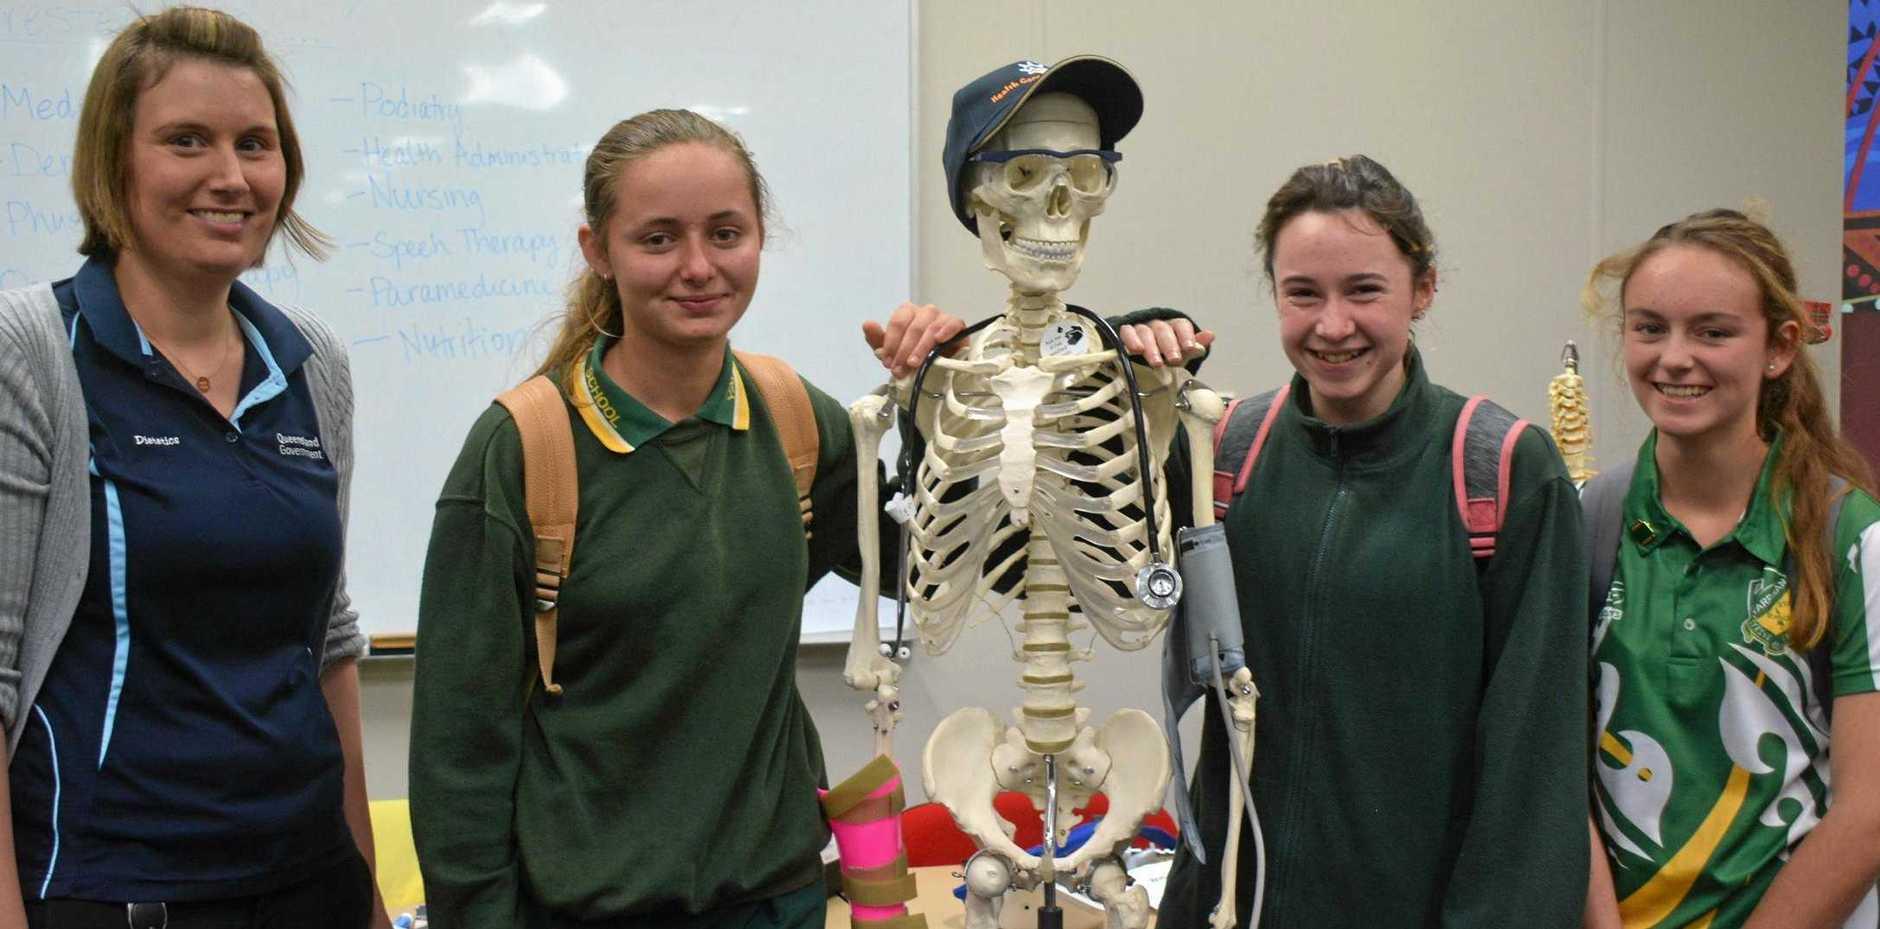 NEW FRIENDS: Dietitian Trina Laidlaw from Kingaroy Hospital and Bridget Dando, Jhavana Perren and Thai-Lia Currell from Yarraman High School meet a new friend 'Sid' the skeleton at last year's careers expo at Kingaroy TAFE.